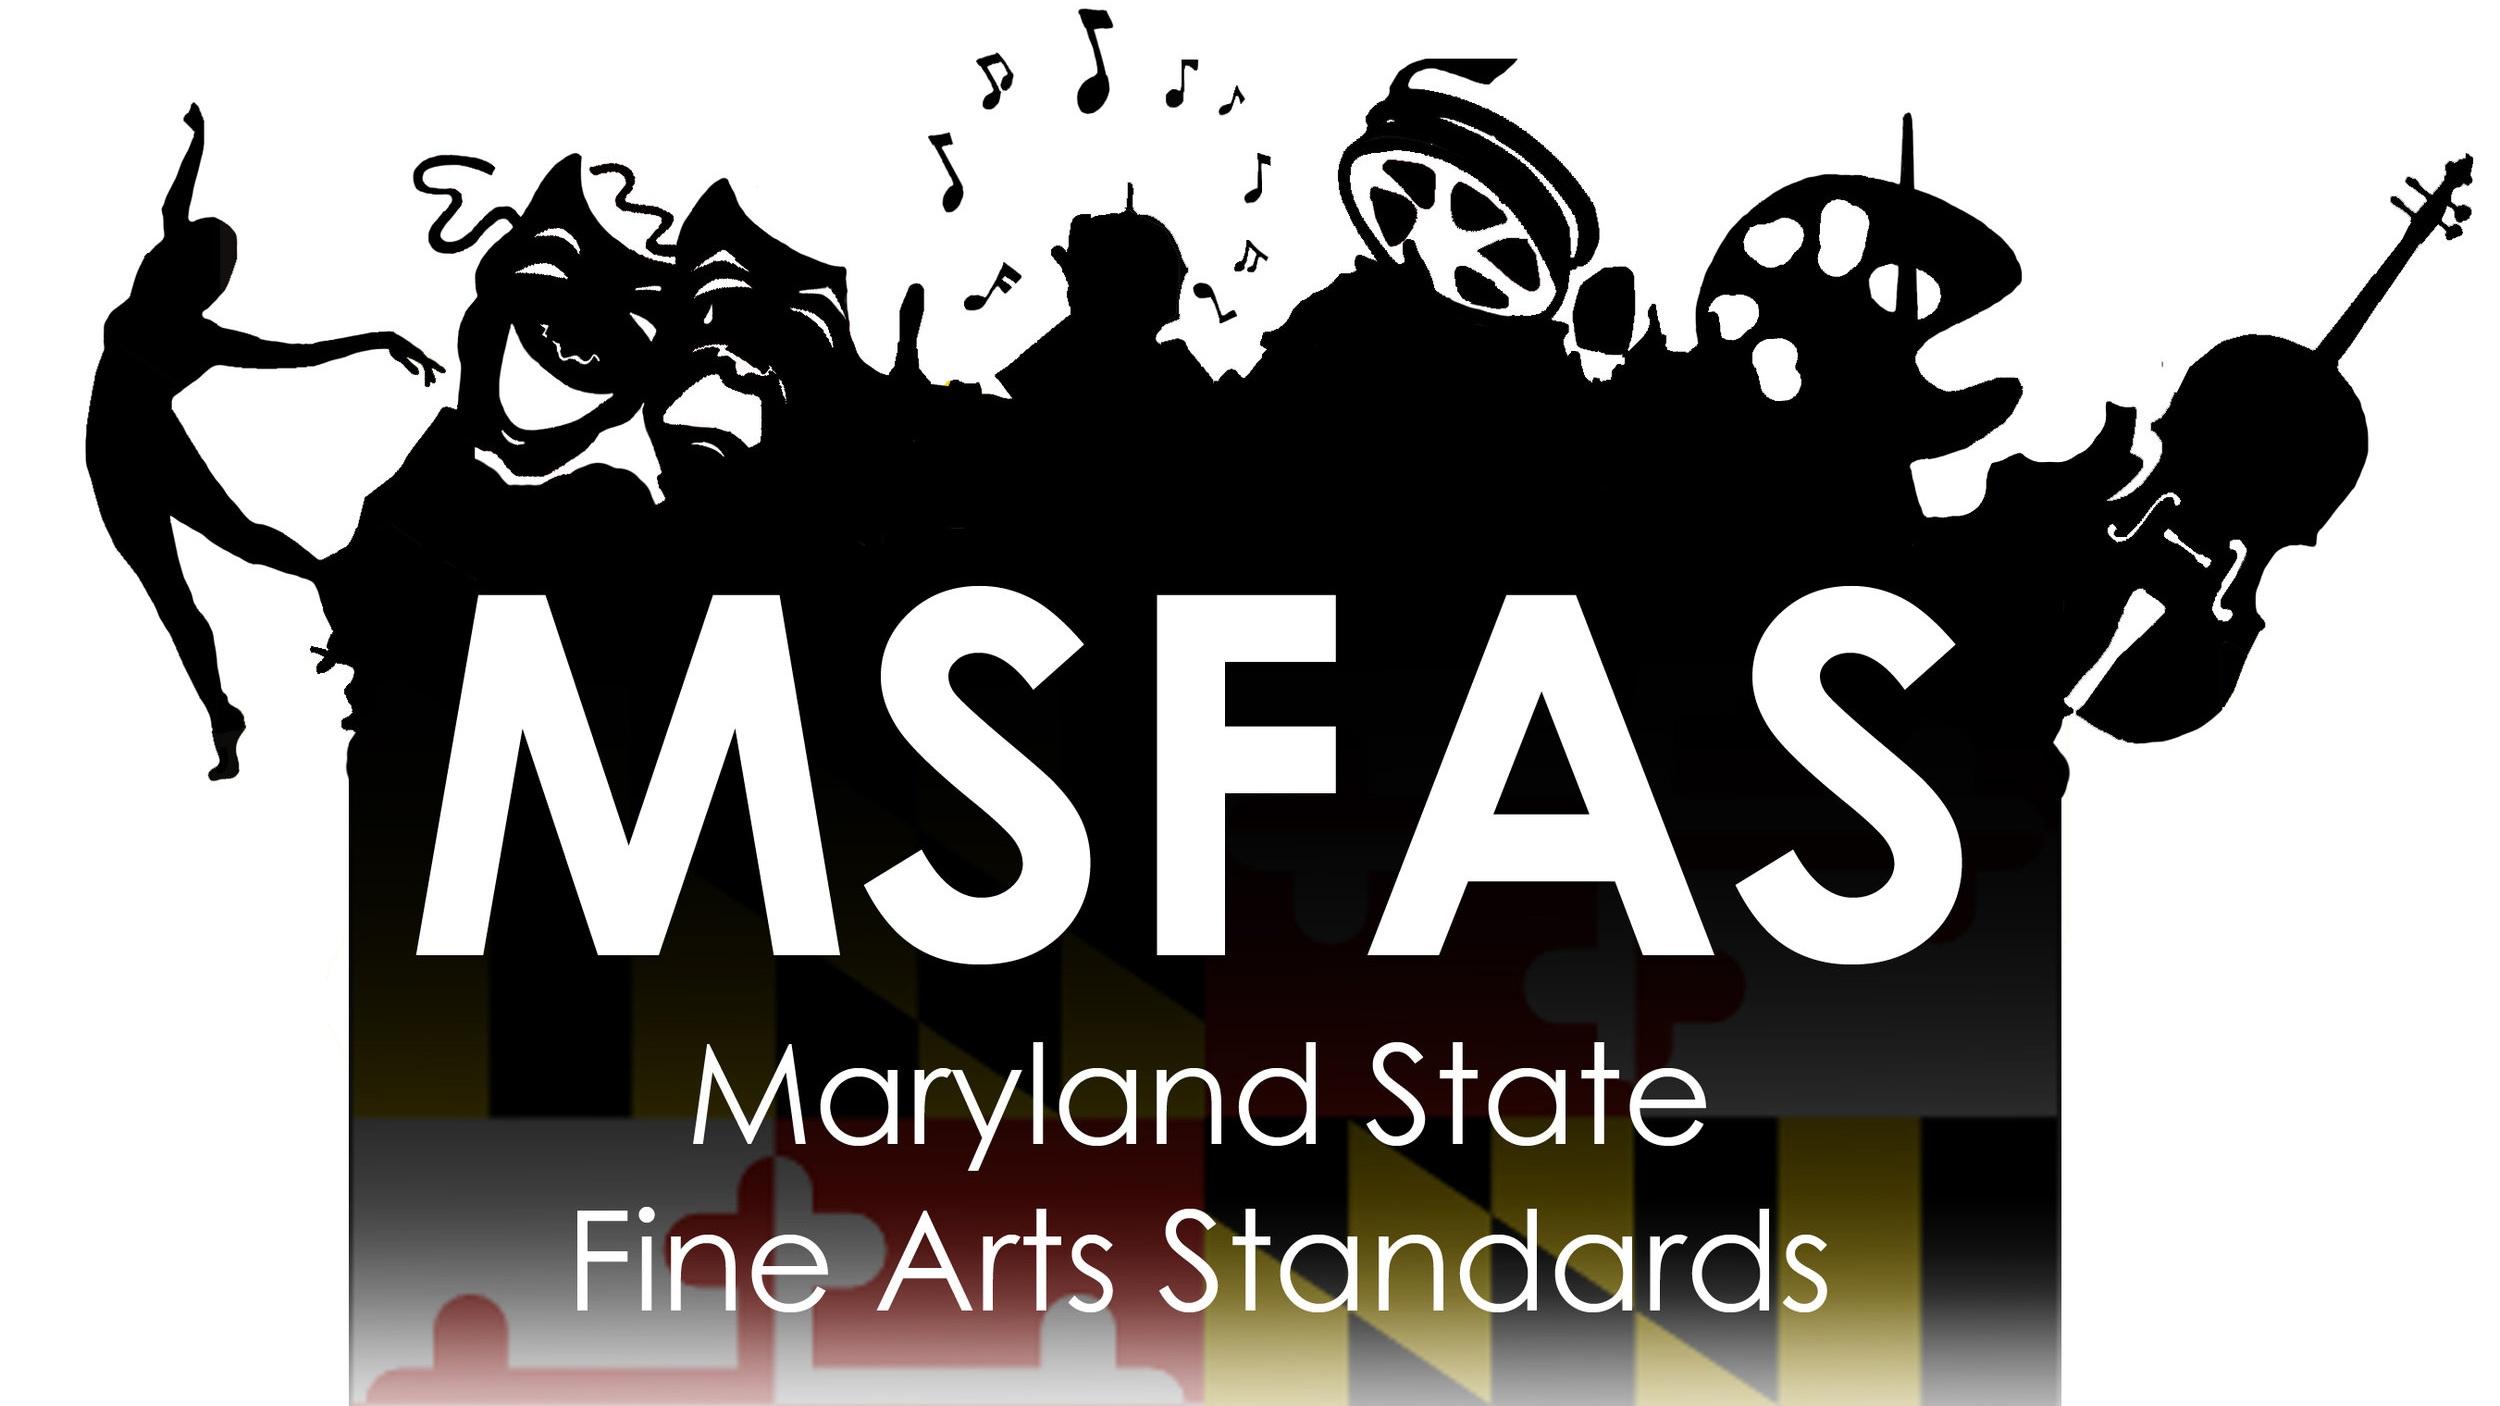 Maryland+State+Fine+Arts+Standards+Logo+copy.jpg